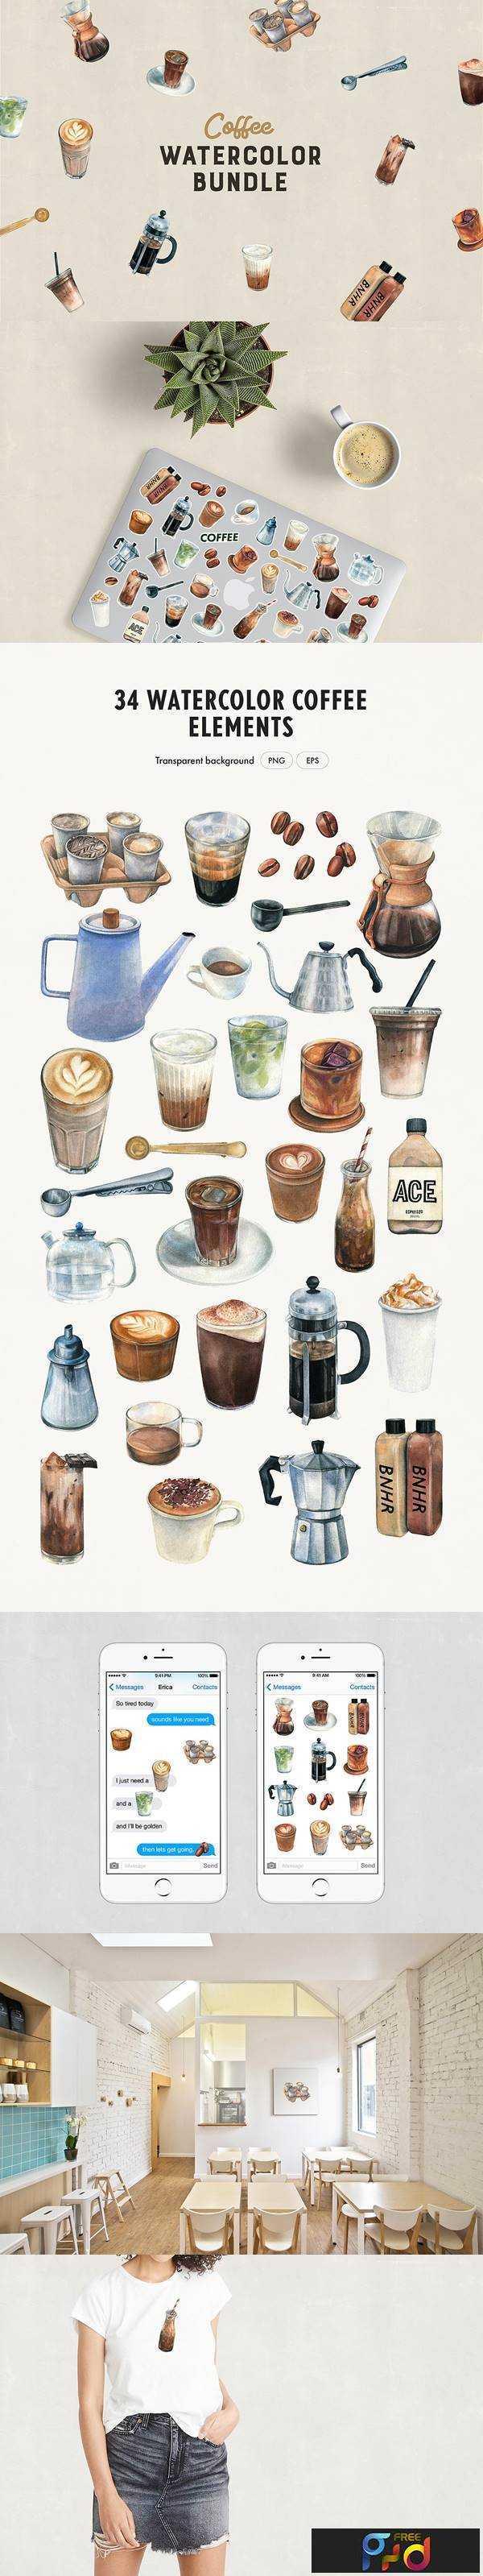 1805295 Watercolor Coffee Bundle 2405258 1